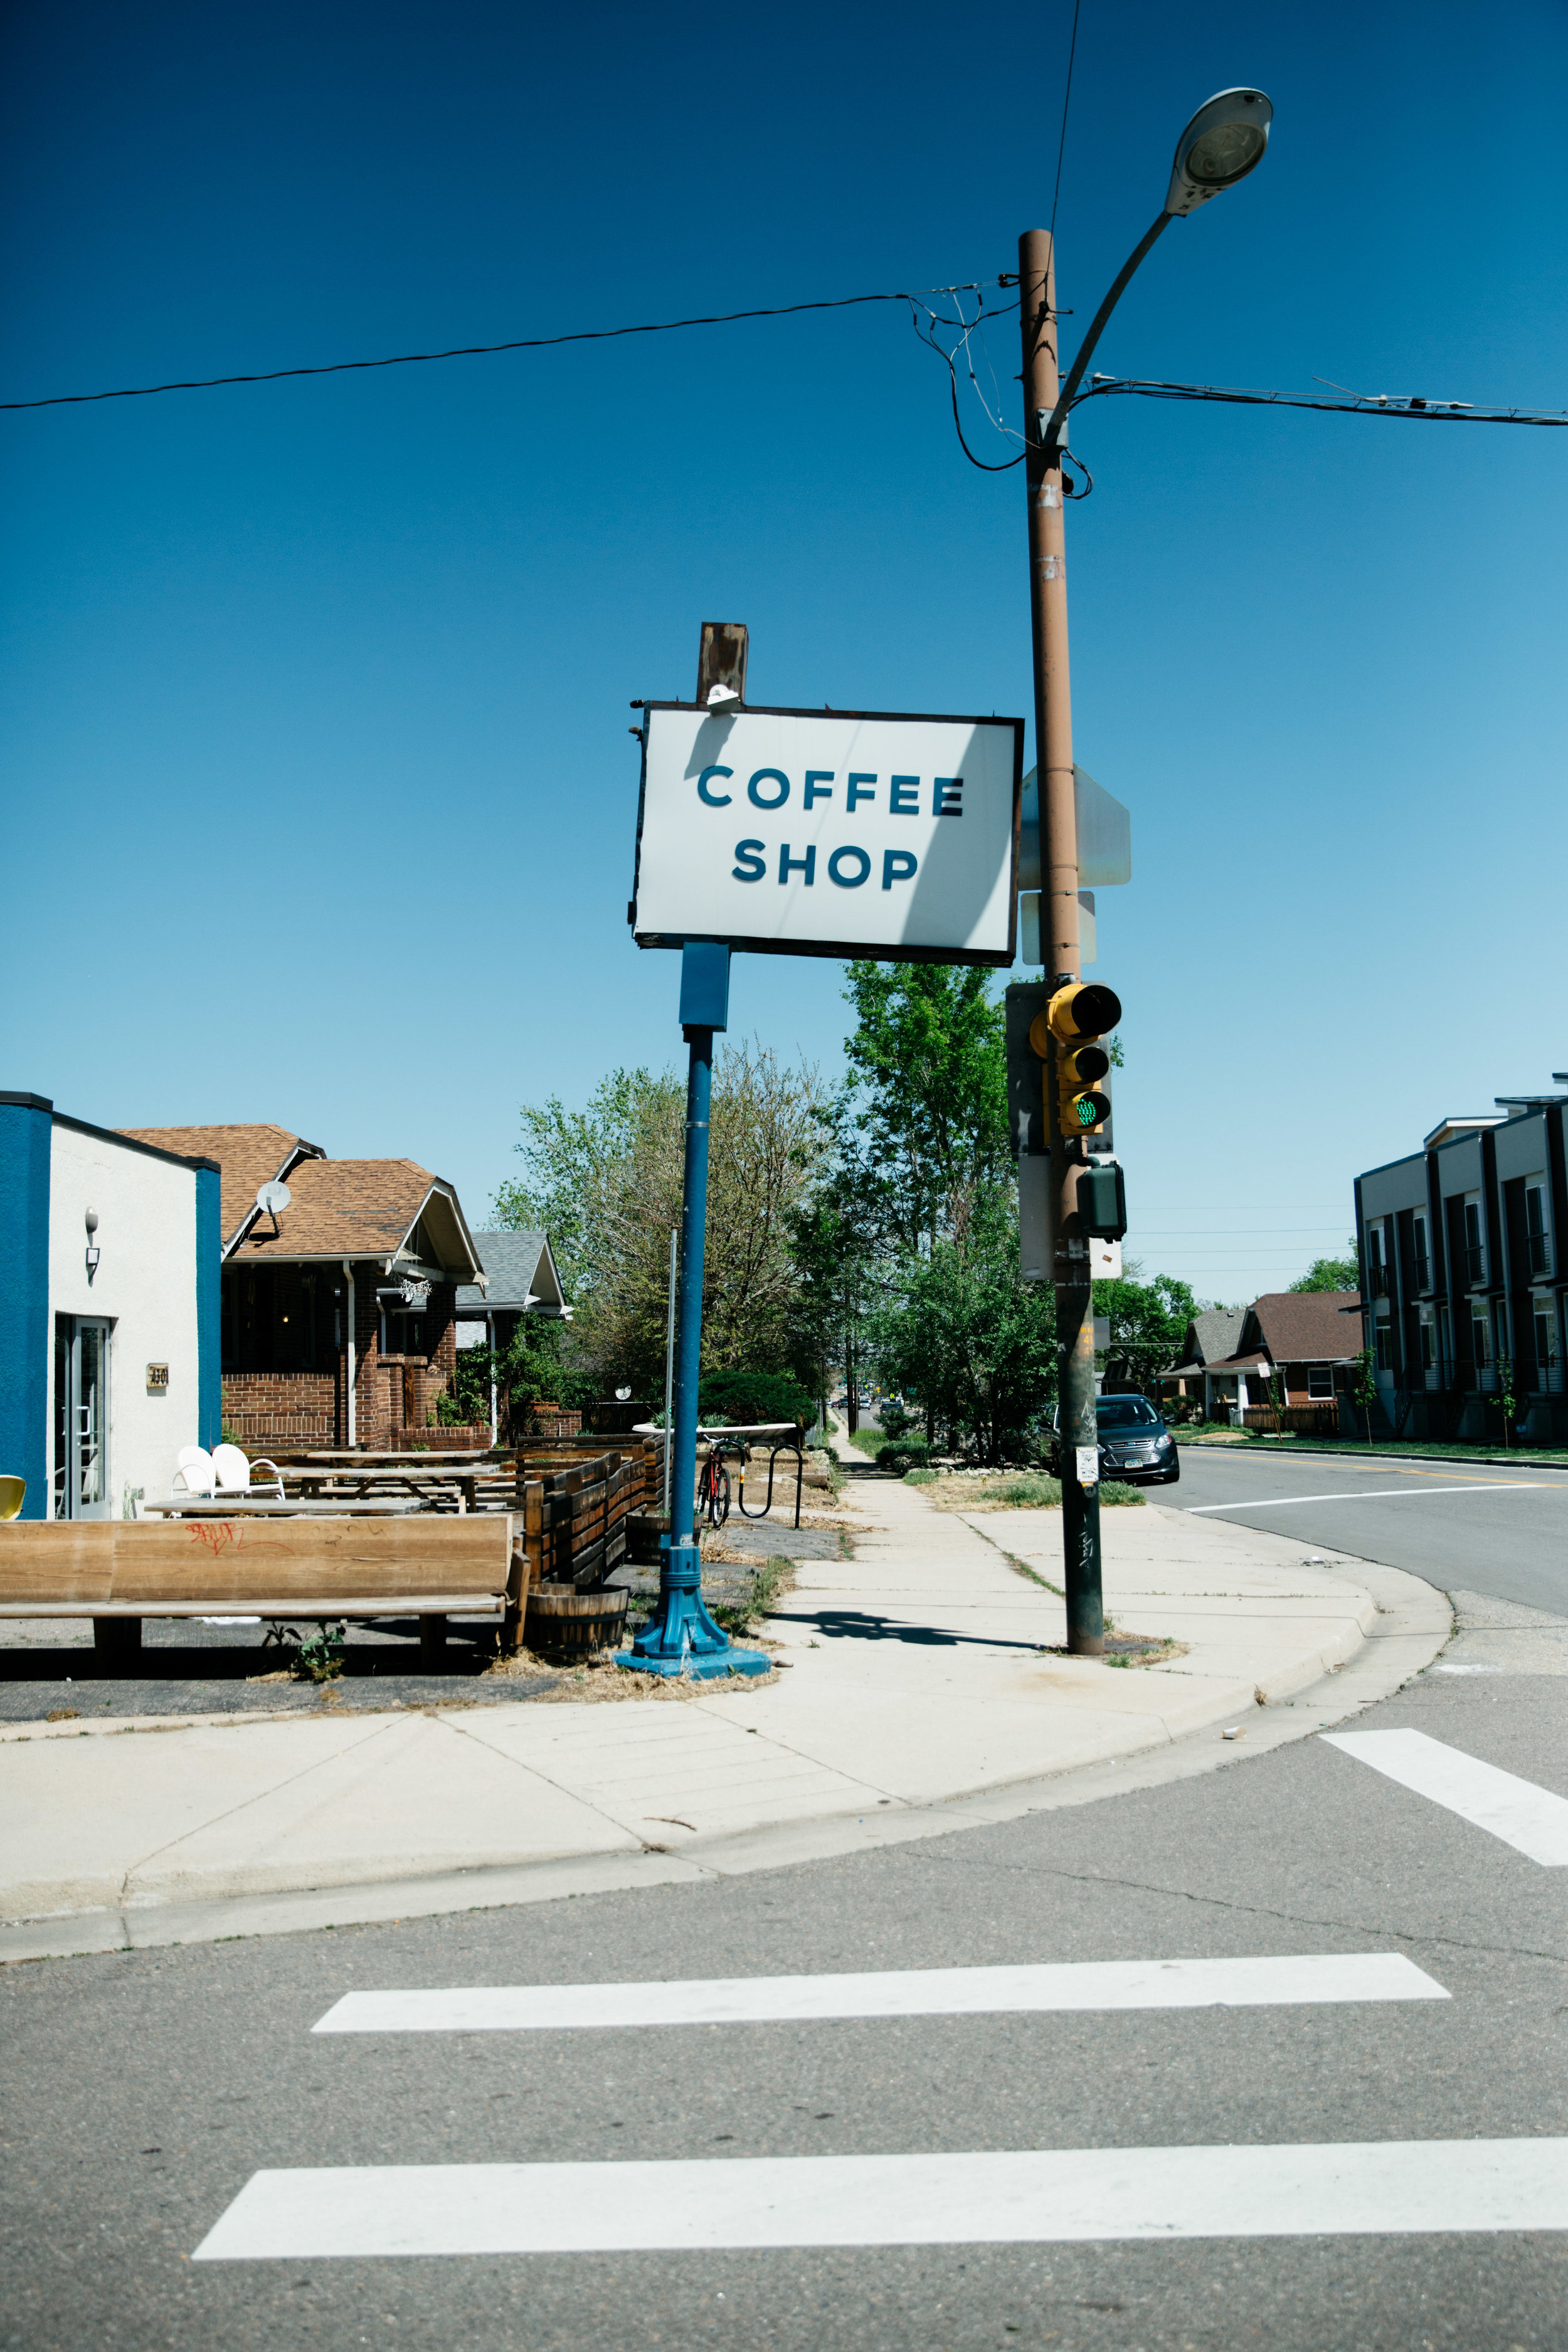 Huckleberry-coffee-tour-fortitude-and-finn-4.jpg